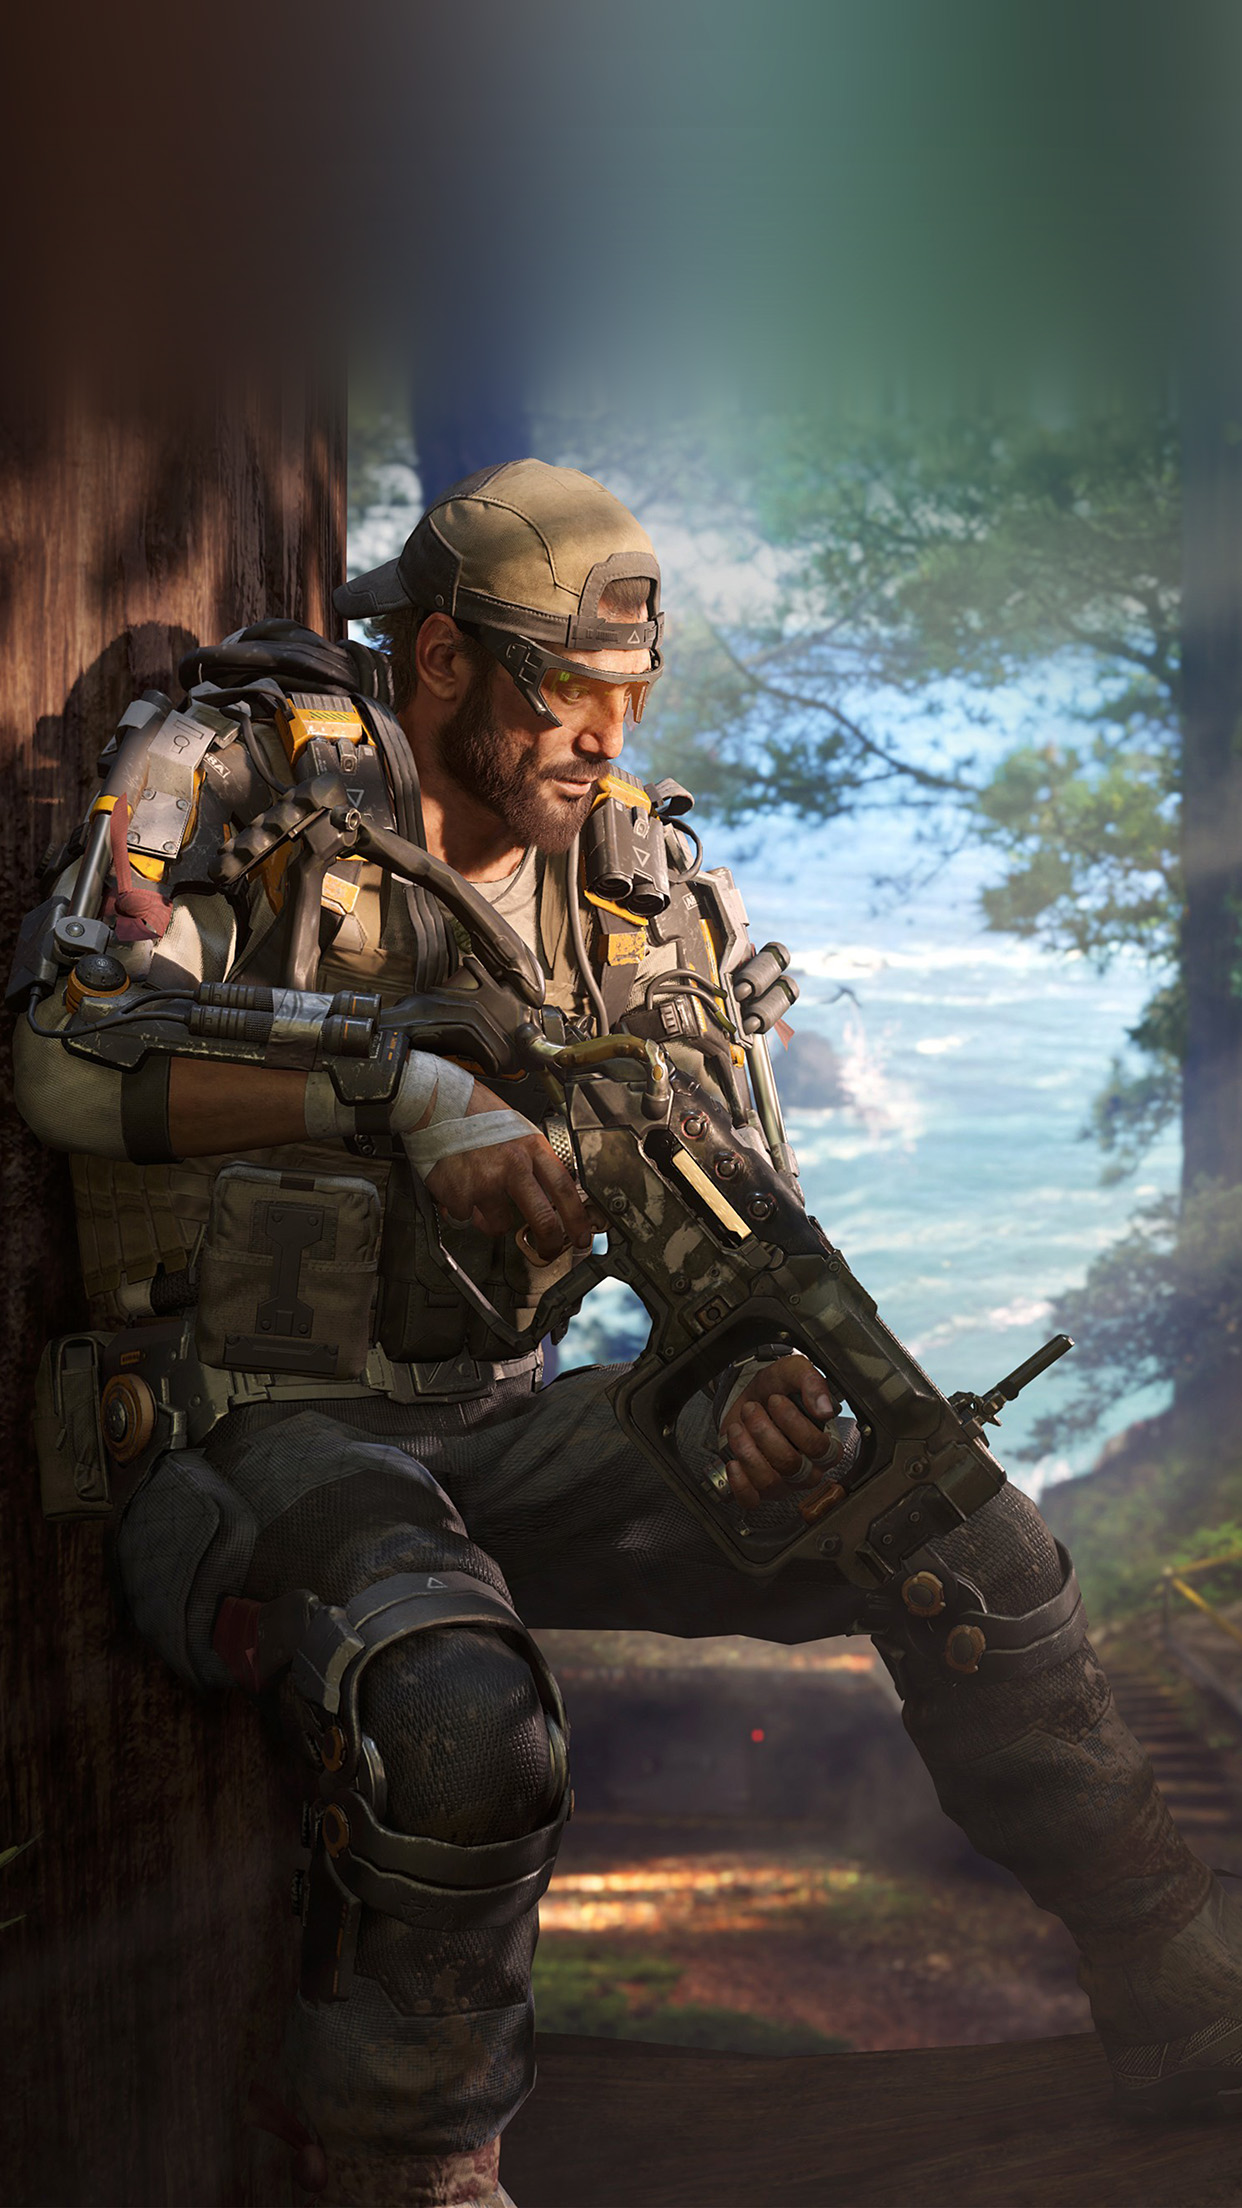 Call Of Duty Blackops Game Illustration Art Android Wallpaper